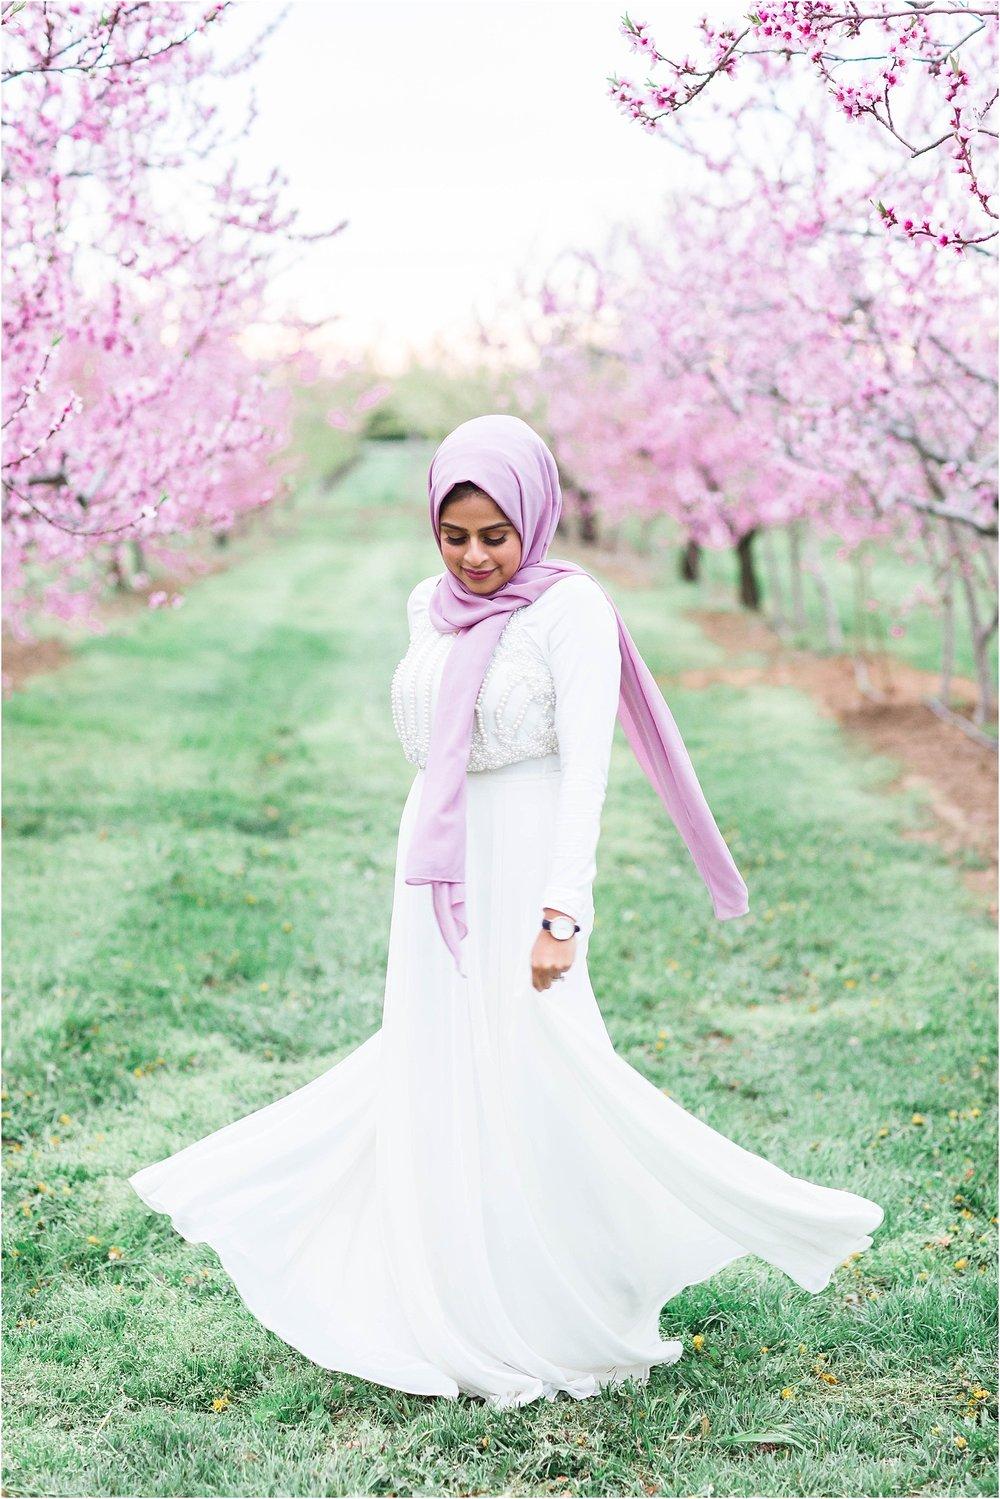 Niagara-on-the-lake-cherry-blossom-farm-Engagement-Session-Toronto-Mississauga-Brampton-Scarborough-GTA-Pakistani-Indian-Wedding-Engagement-Photographer-Photography_0034.jpg